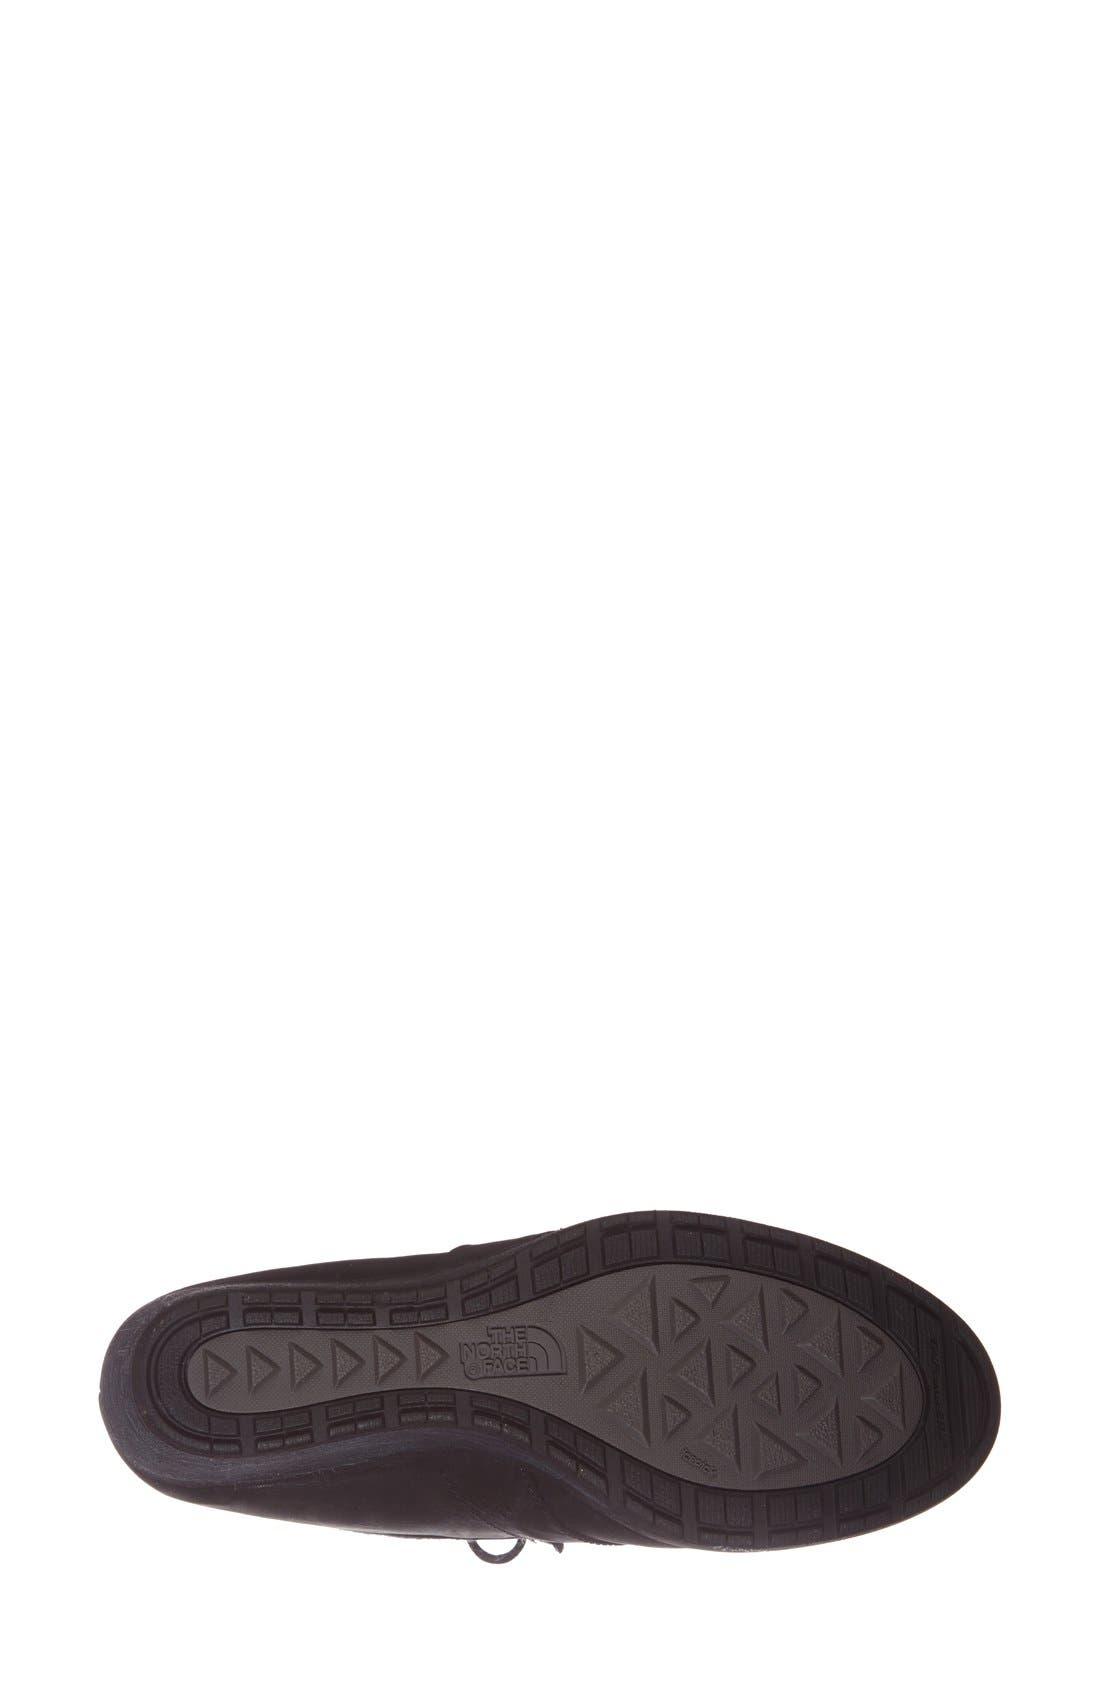 'Bridgeton Wedge Lace' Waterproof Boot,                             Alternate thumbnail 5, color,                             001